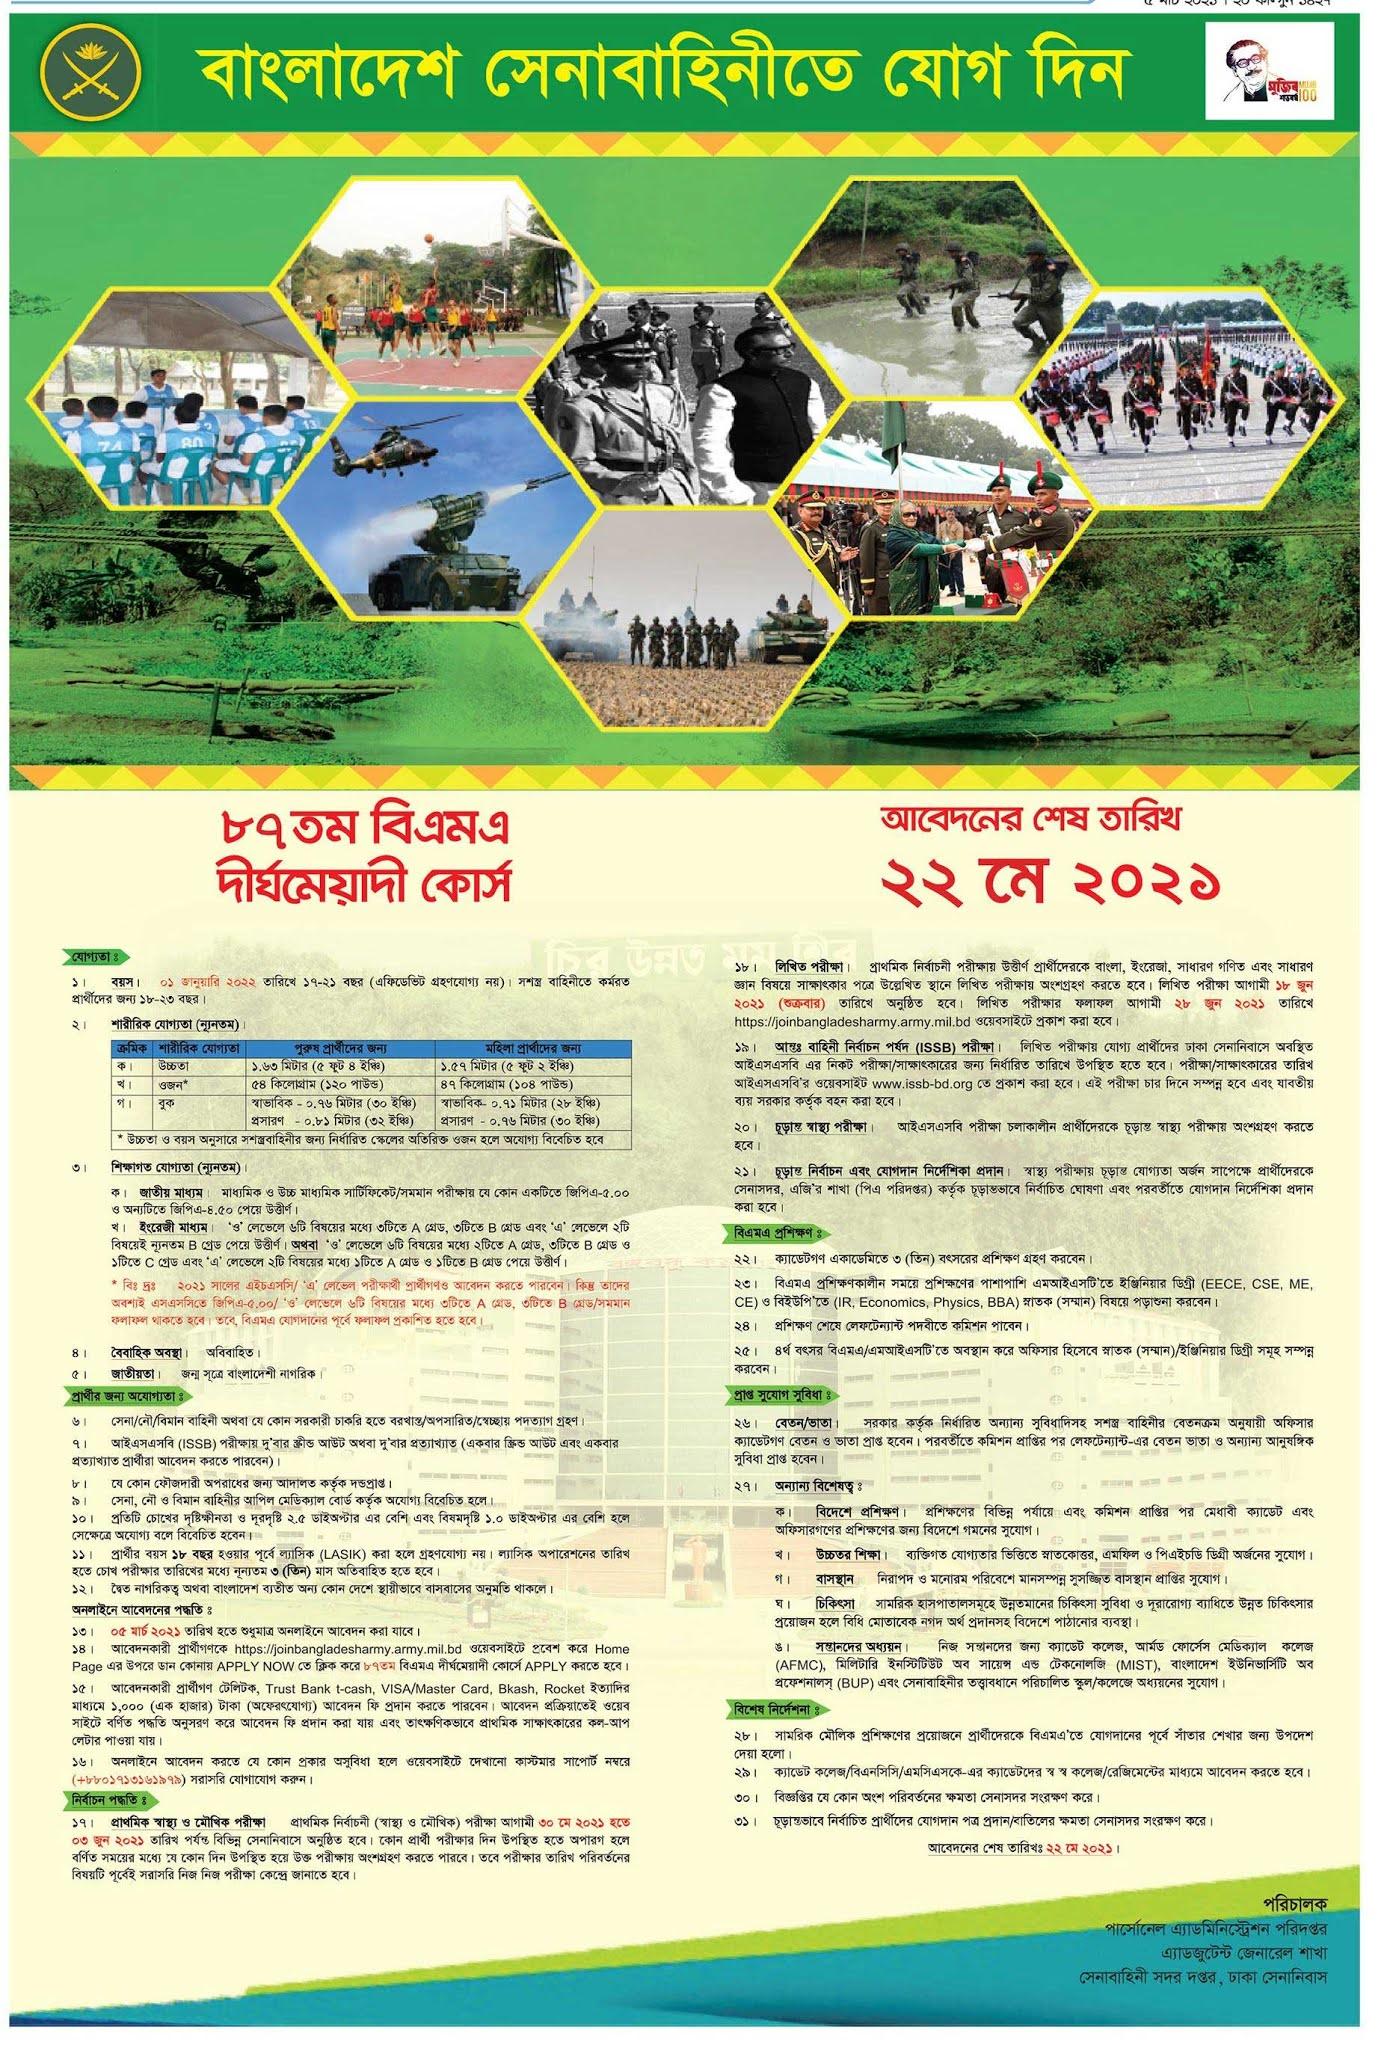 Bangladesh Army Job Circular 2021 - বাংলাদেশ সেনাবাহিনীতে নিয়োগ বিজ্ঞপ্তি ২০২১ - সরকারি চাকরির খবর ২০২১